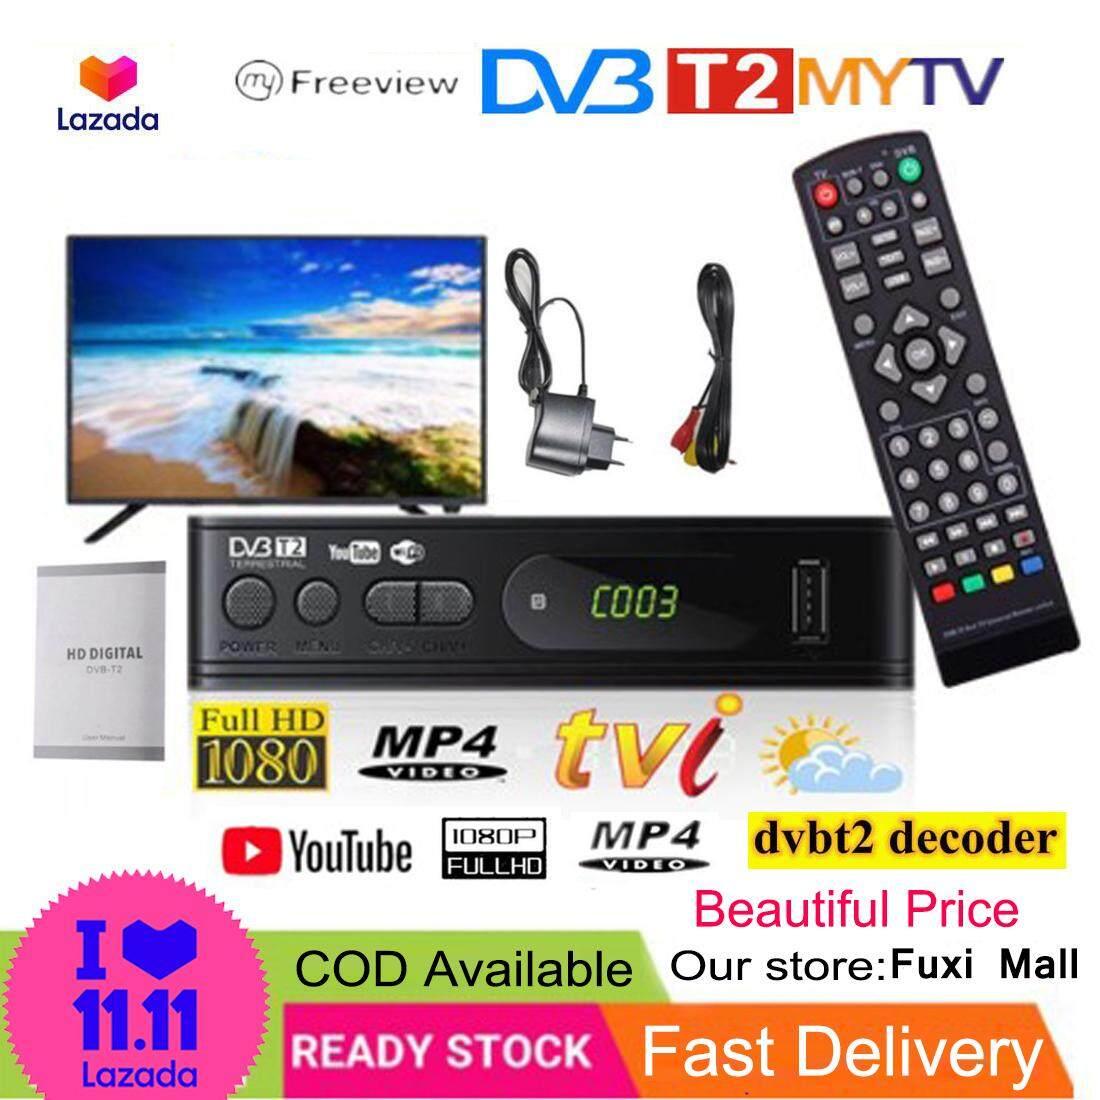 Ready Stock DVBT2 K2 Decoder DVB T2 Decoder Myfreeview MyTV Decoder DVB T2  Receiver Satellite TV Support Wifi Full HD TV Digital